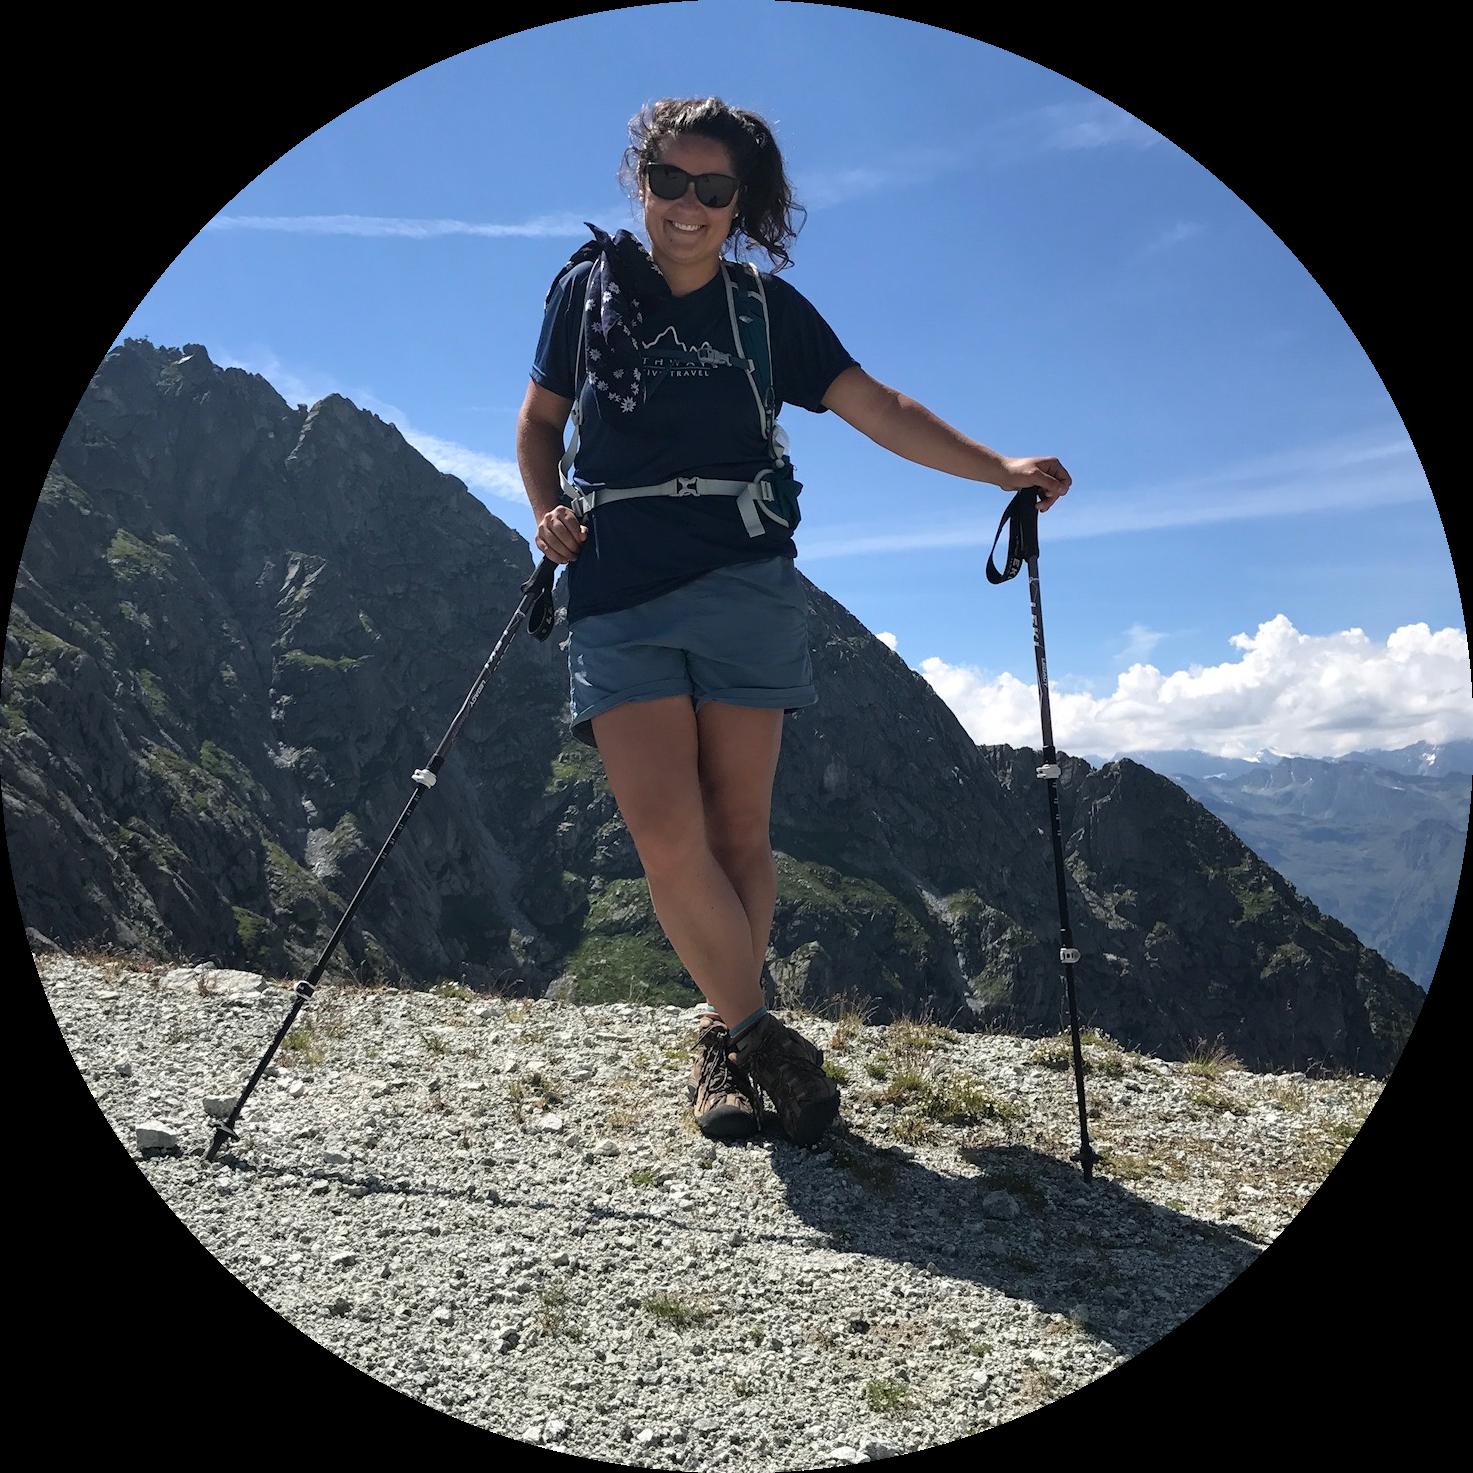 Sarah hiking in Merano | Summer 2017